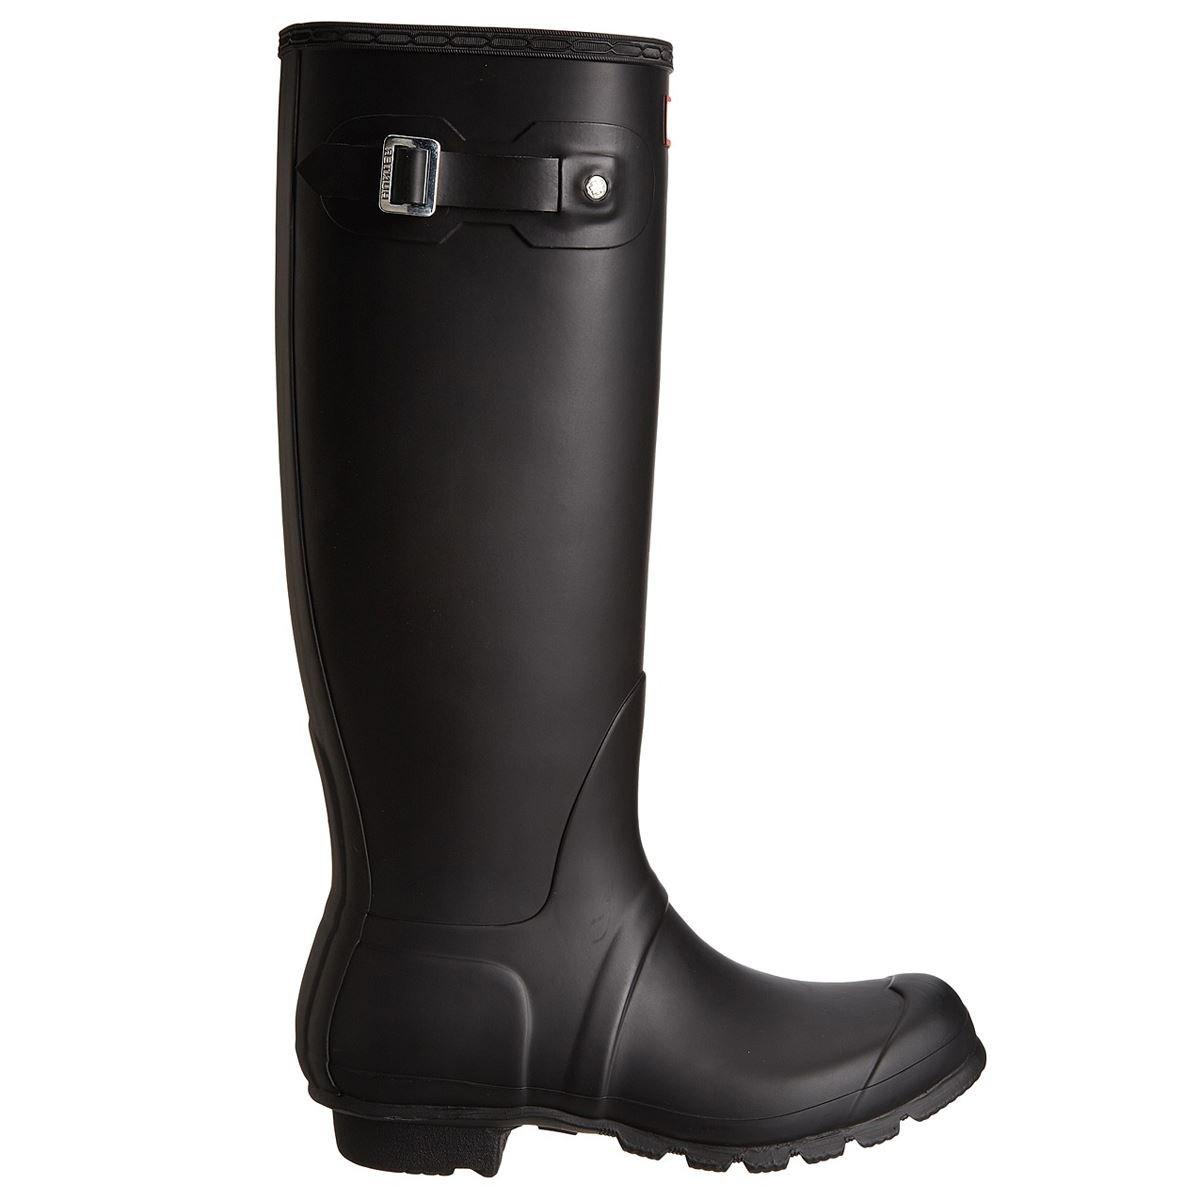 Hunter Women's Original Tall Snow Boot, Black, 8 M